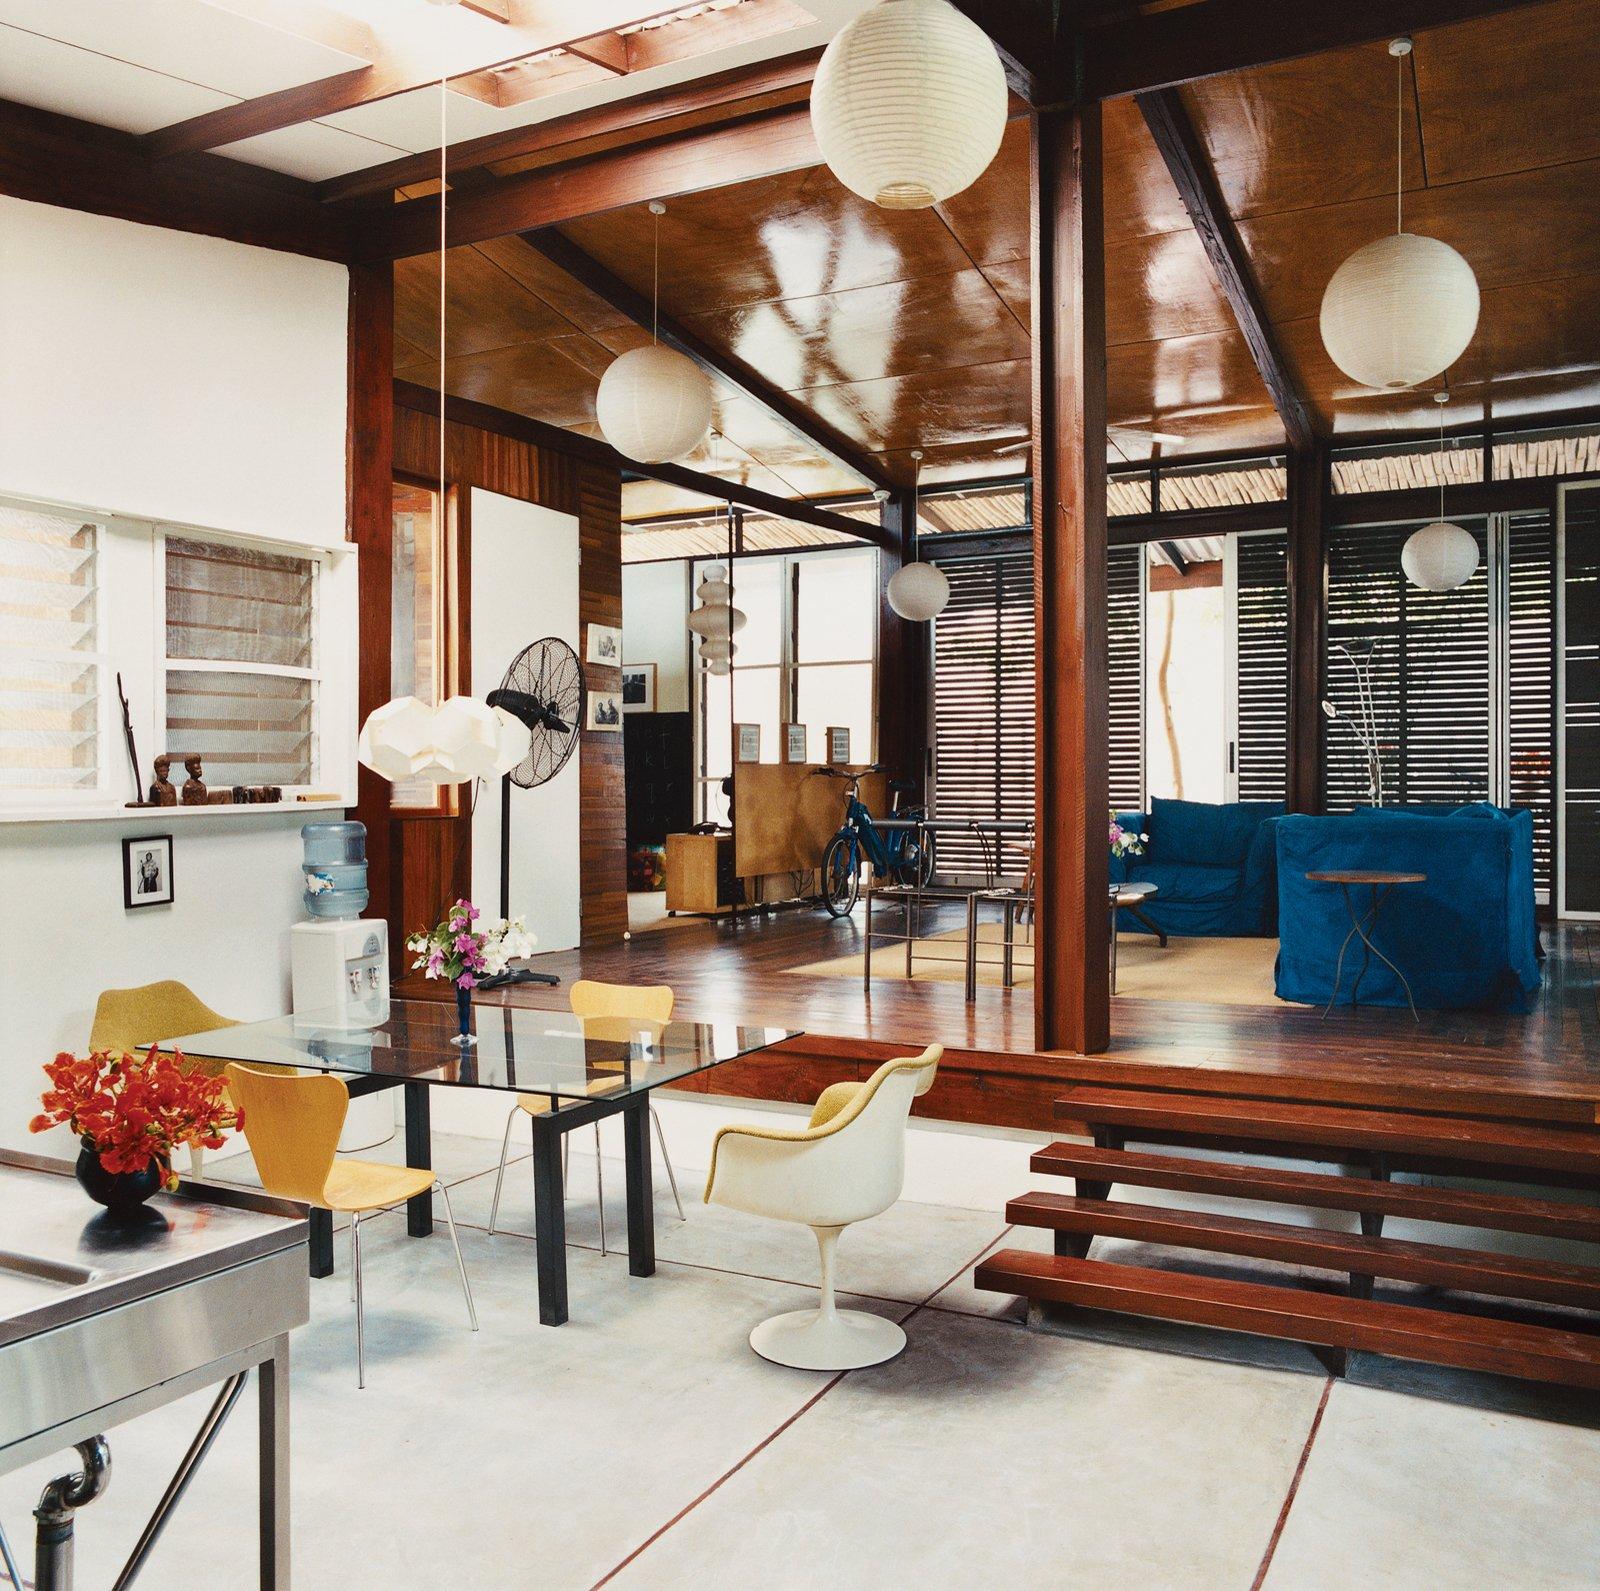 #diningroom #livingroom #lighting #interior #modern #openfloorplan #glasstable #woodfloor  60+ Modern Lighting Solutions by Dwell